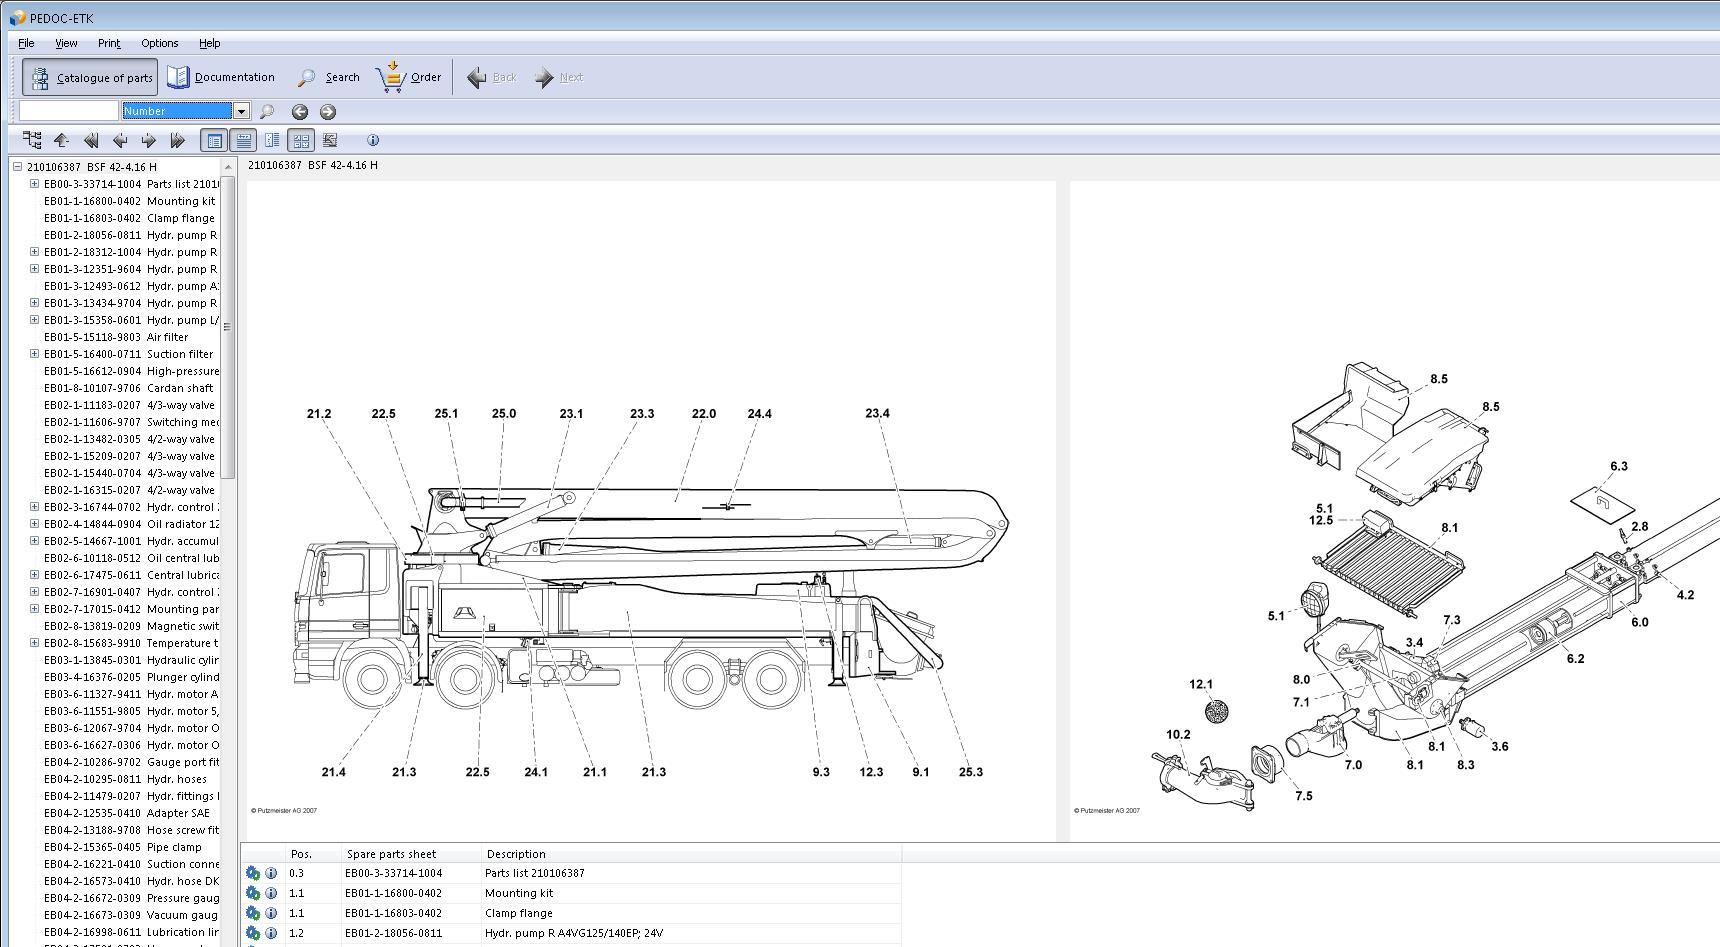 putzmeister wiring diagram wiring diagram schematics Putzmeister Wiring Diagram putzmeister wiring diagram wiring